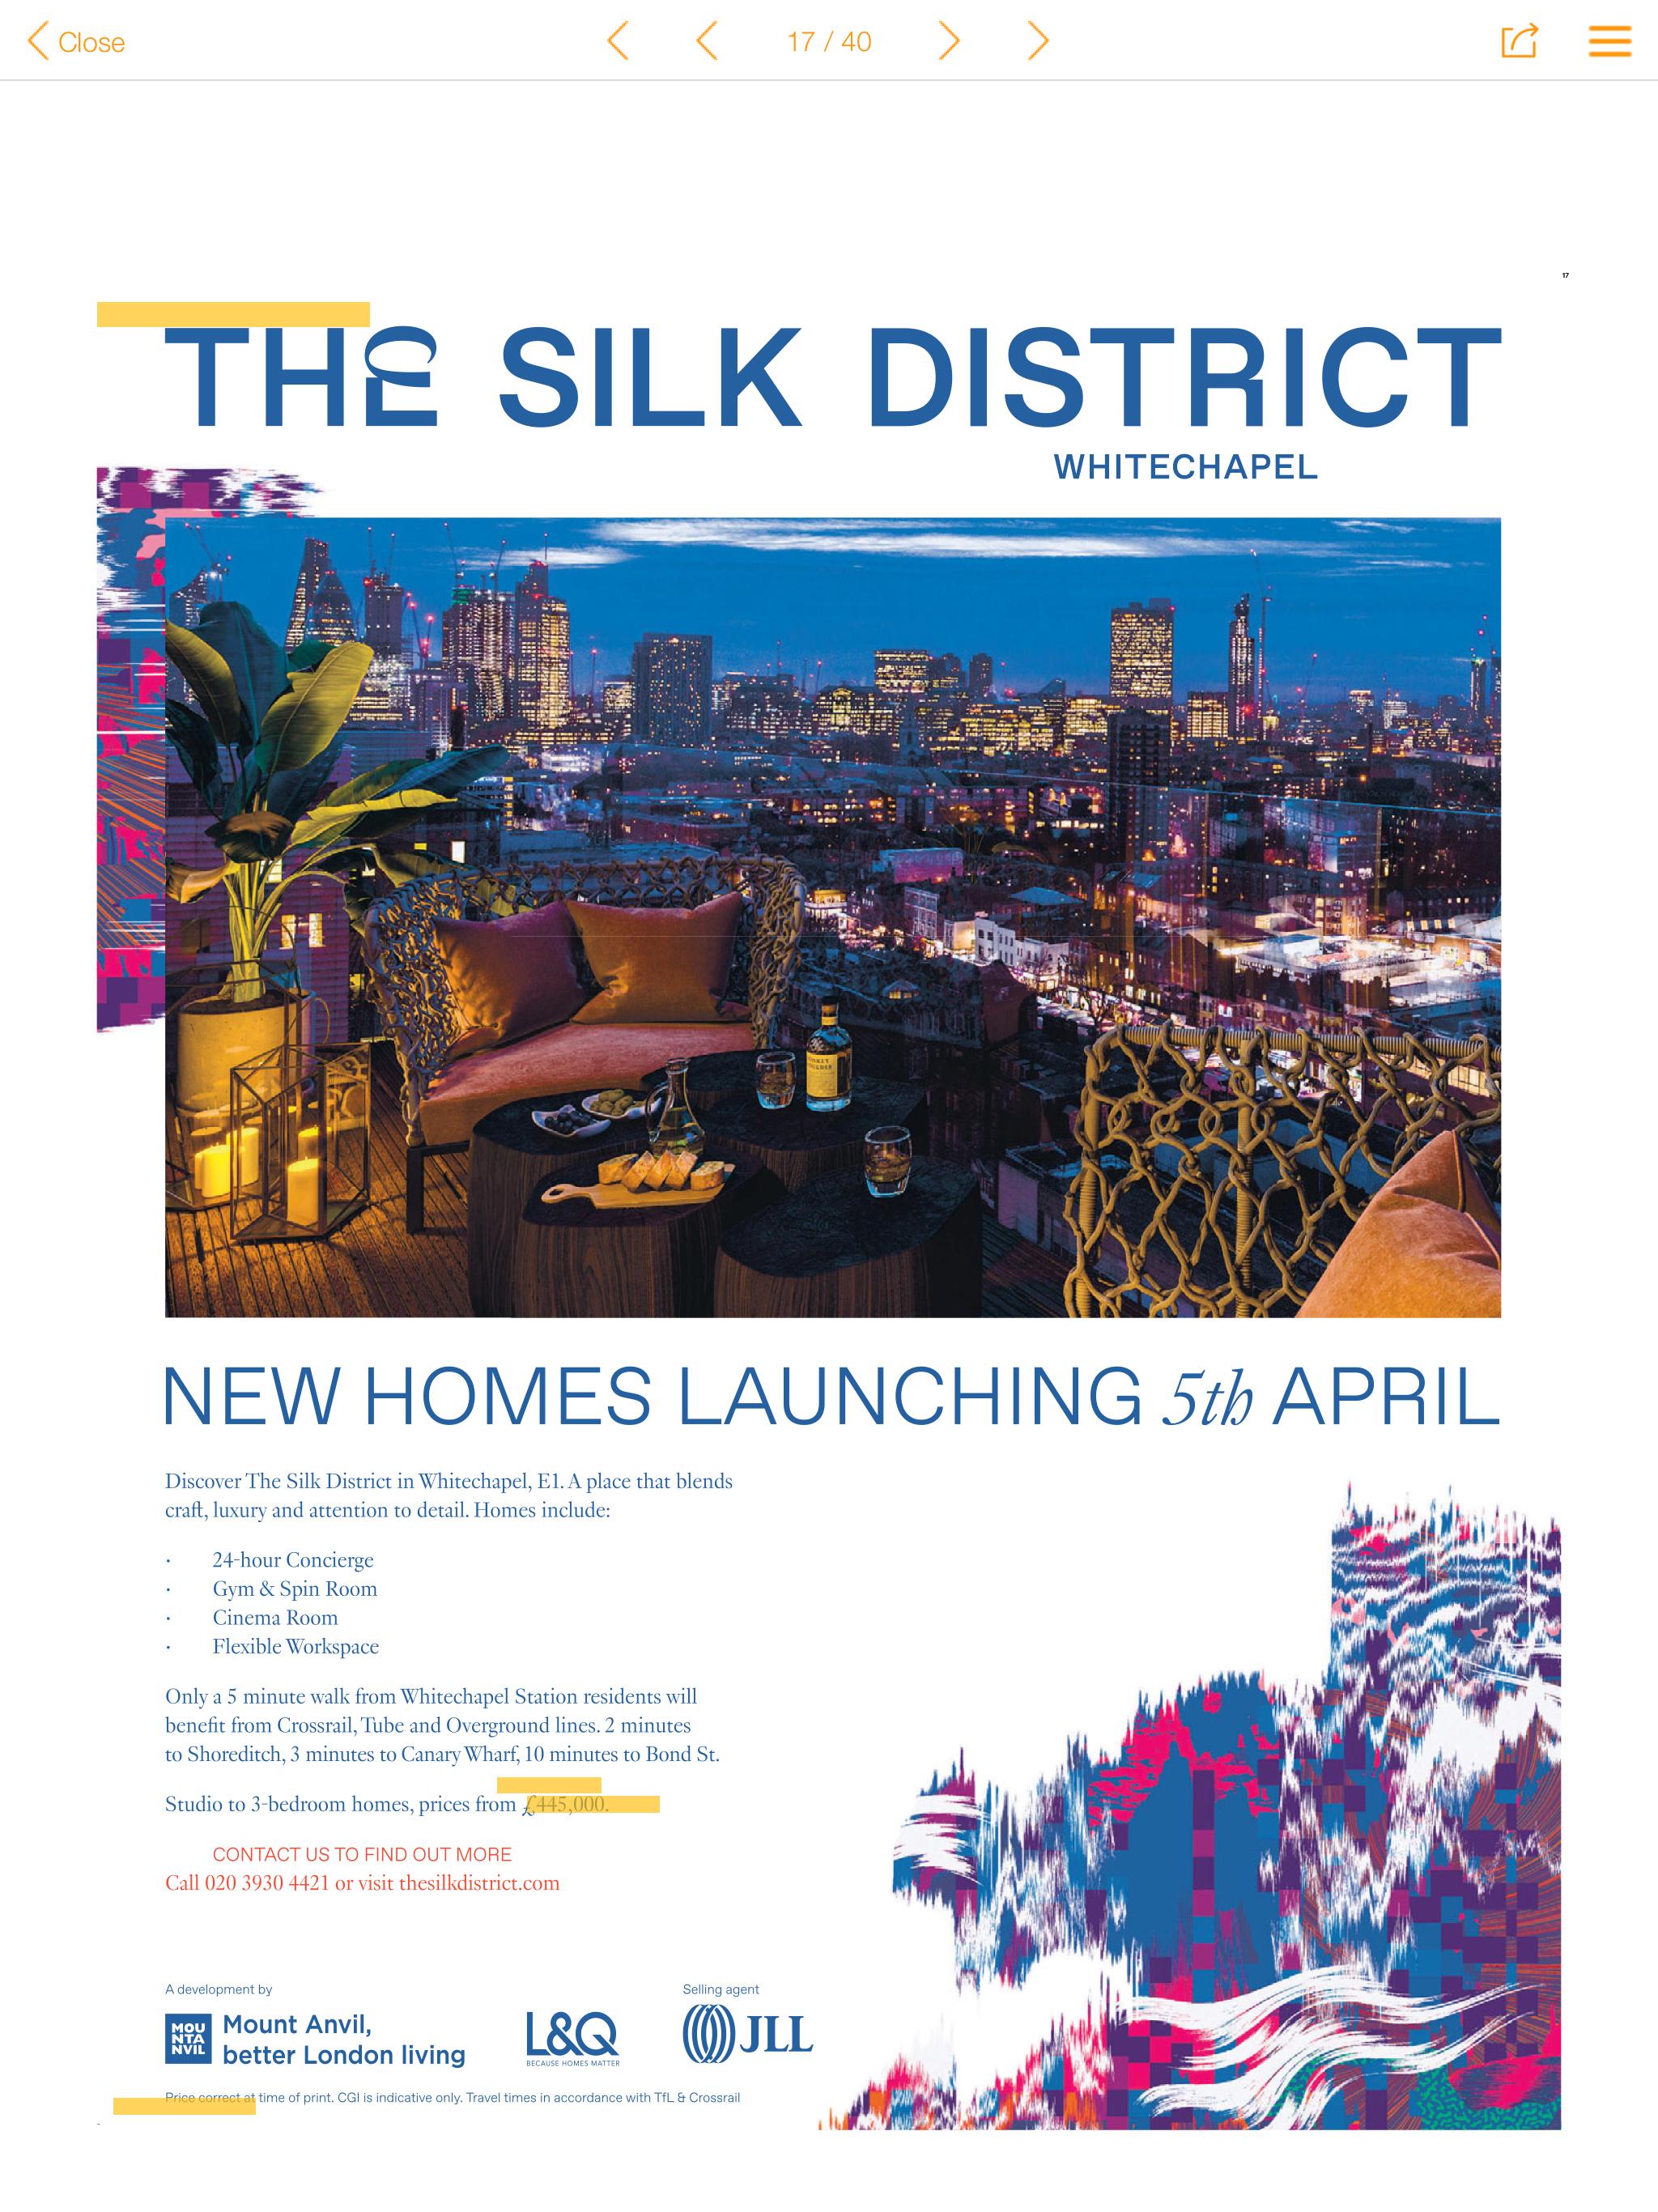 the silk district development ad